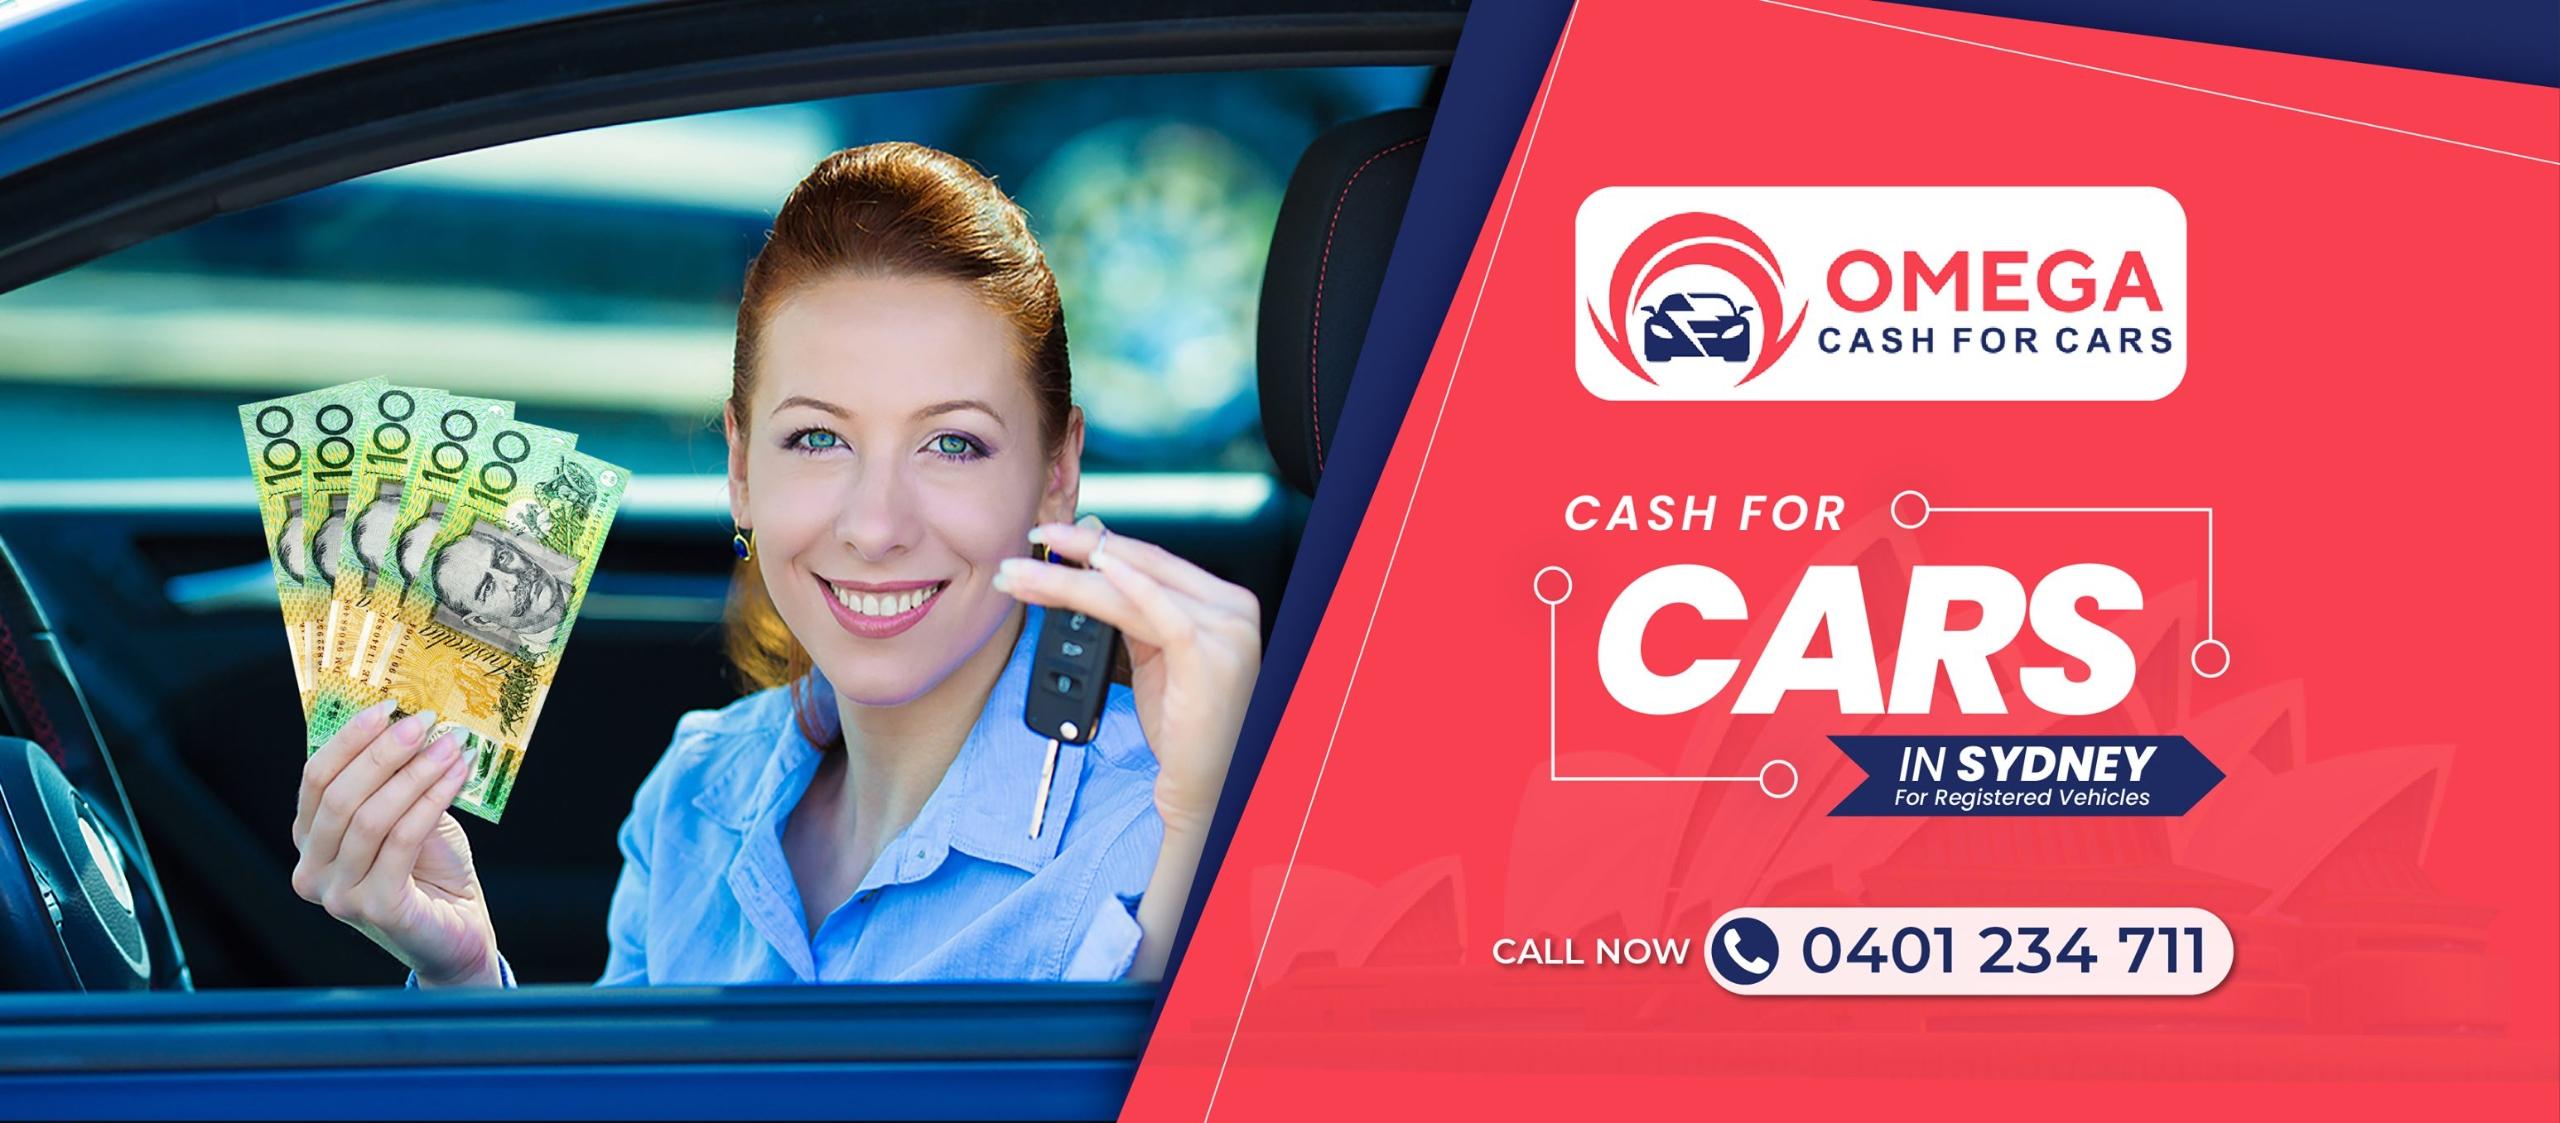 Omega Cash for Cars (@omegacashforcars) Cover Image